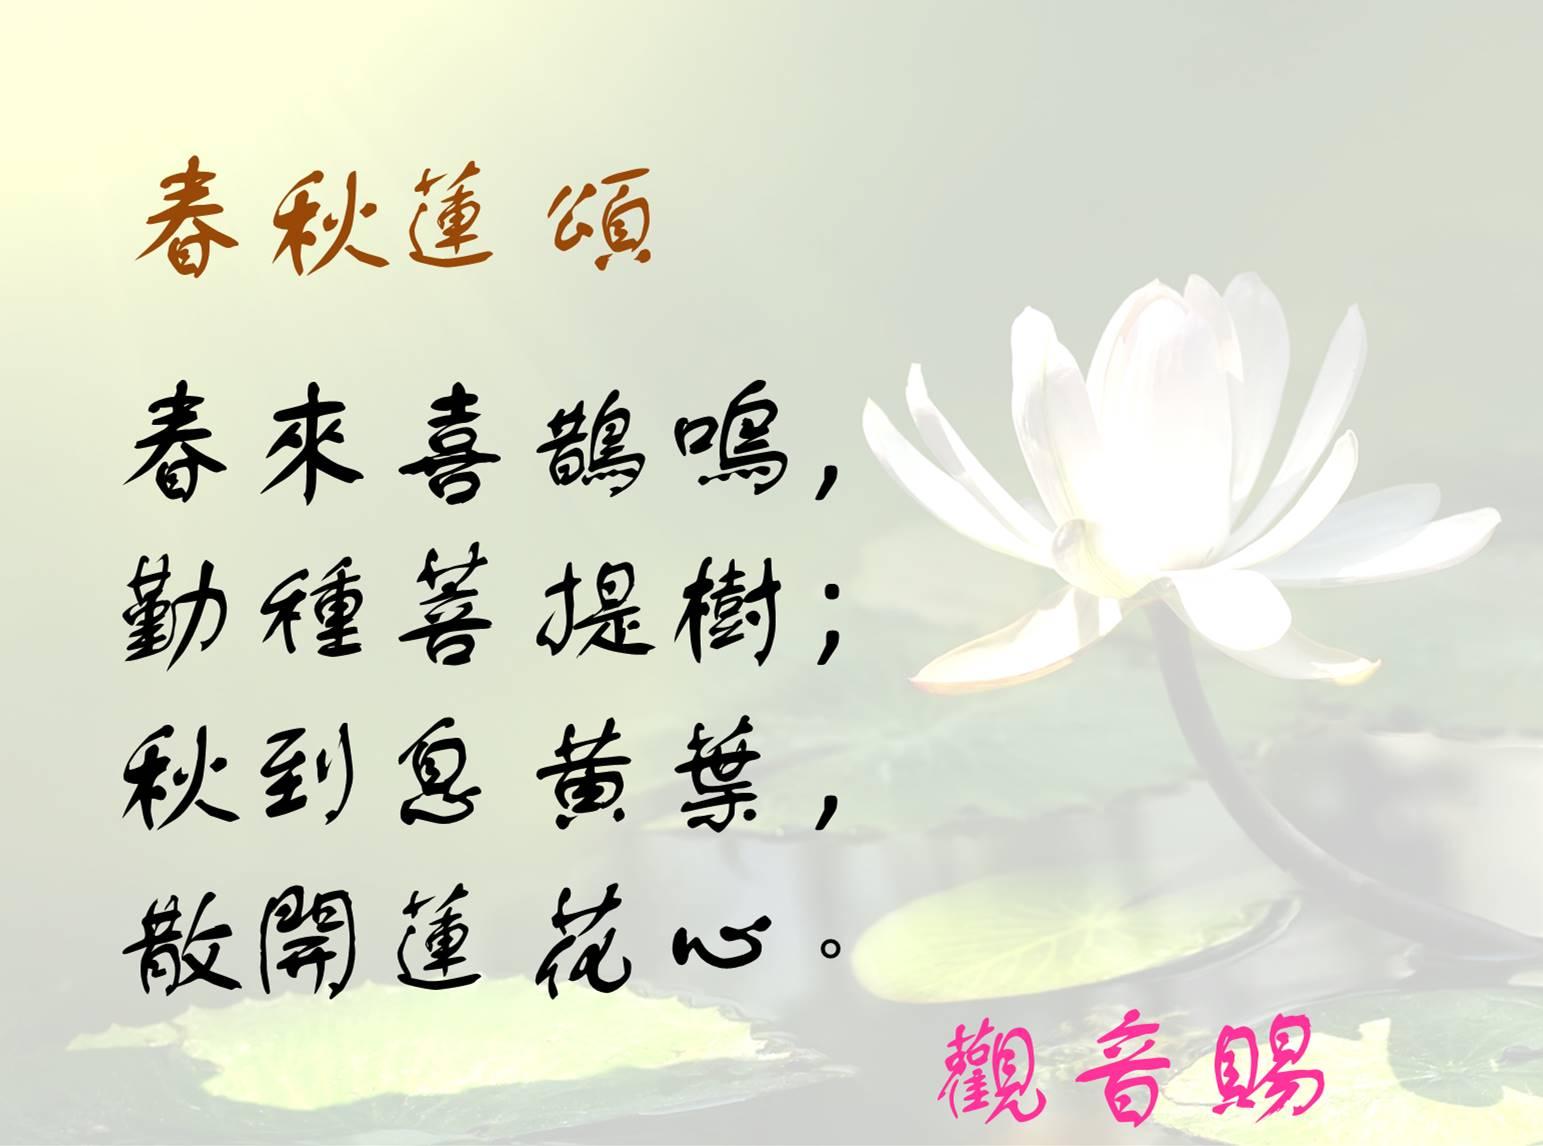 Equinox Gift From Goddess Kuan Yin Acast